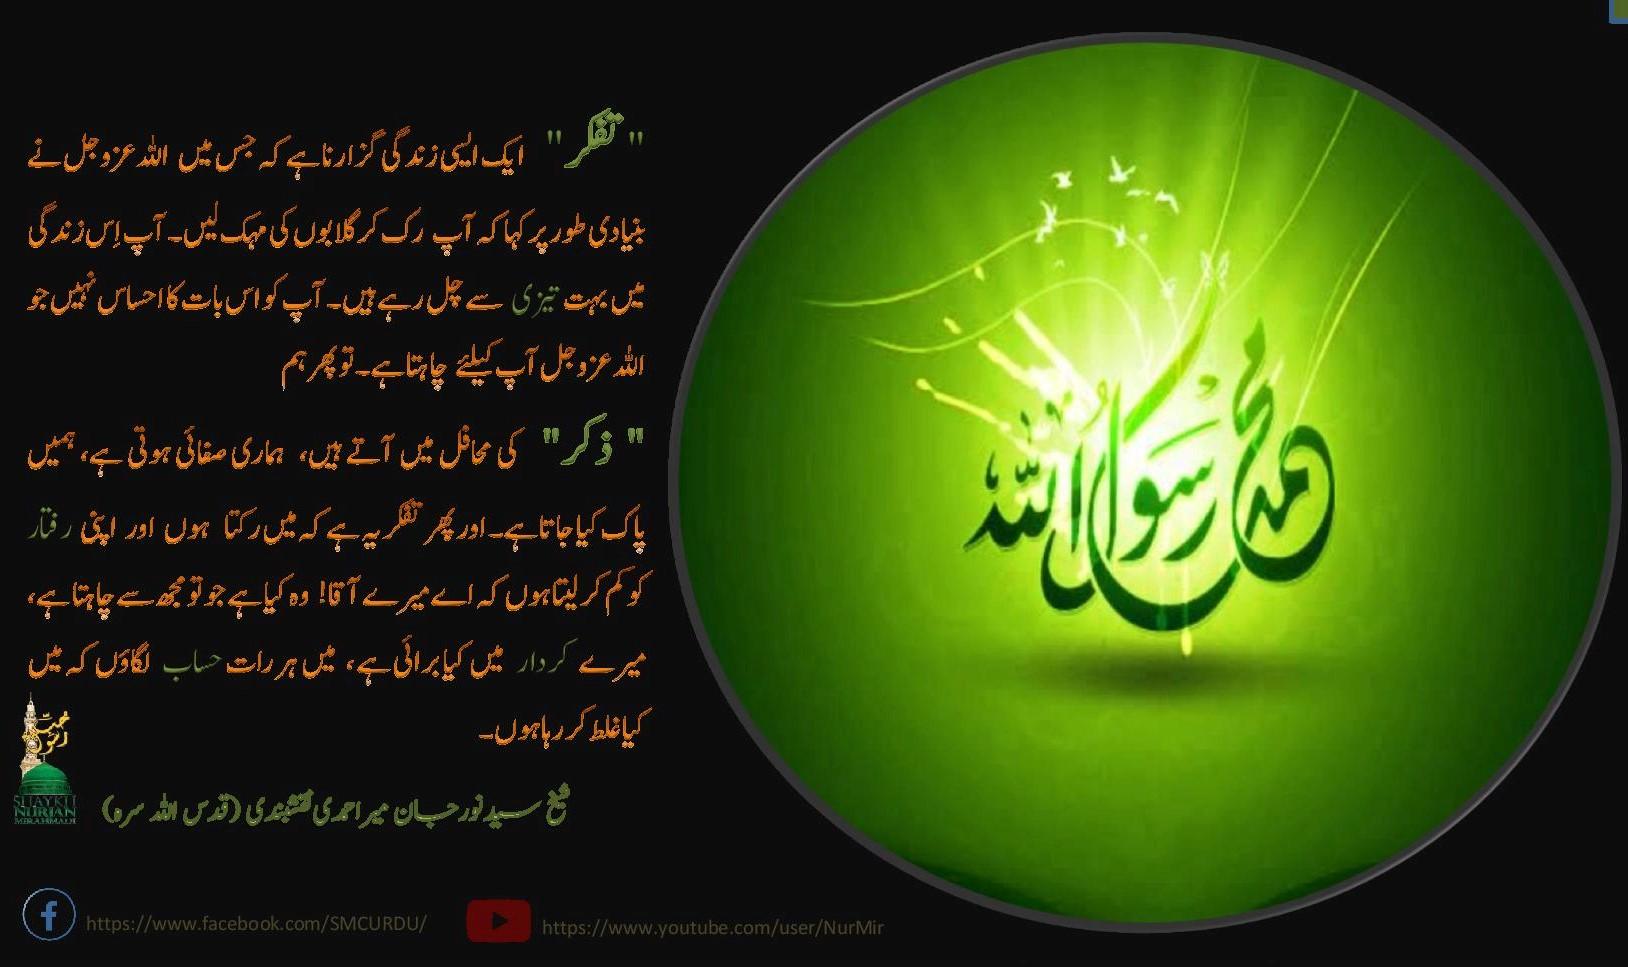 شیخ سید نورجان میراحمدی نقشبندی (ق) کی سنہری تعلیمات سے اقتباس۔  بِسْمِ اللَّـهِ...